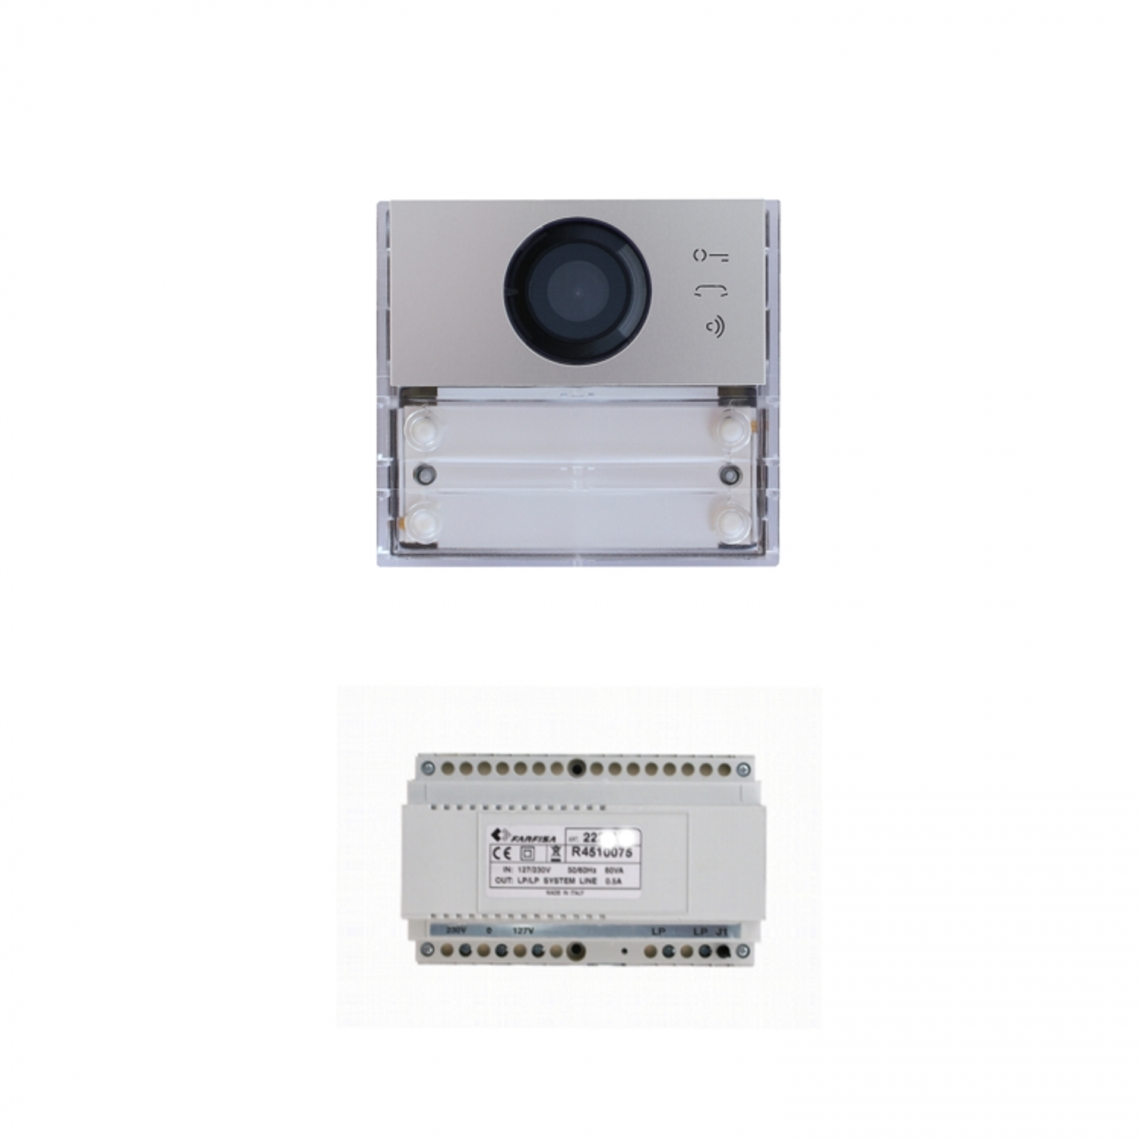 Videokit basic installation - BVAB